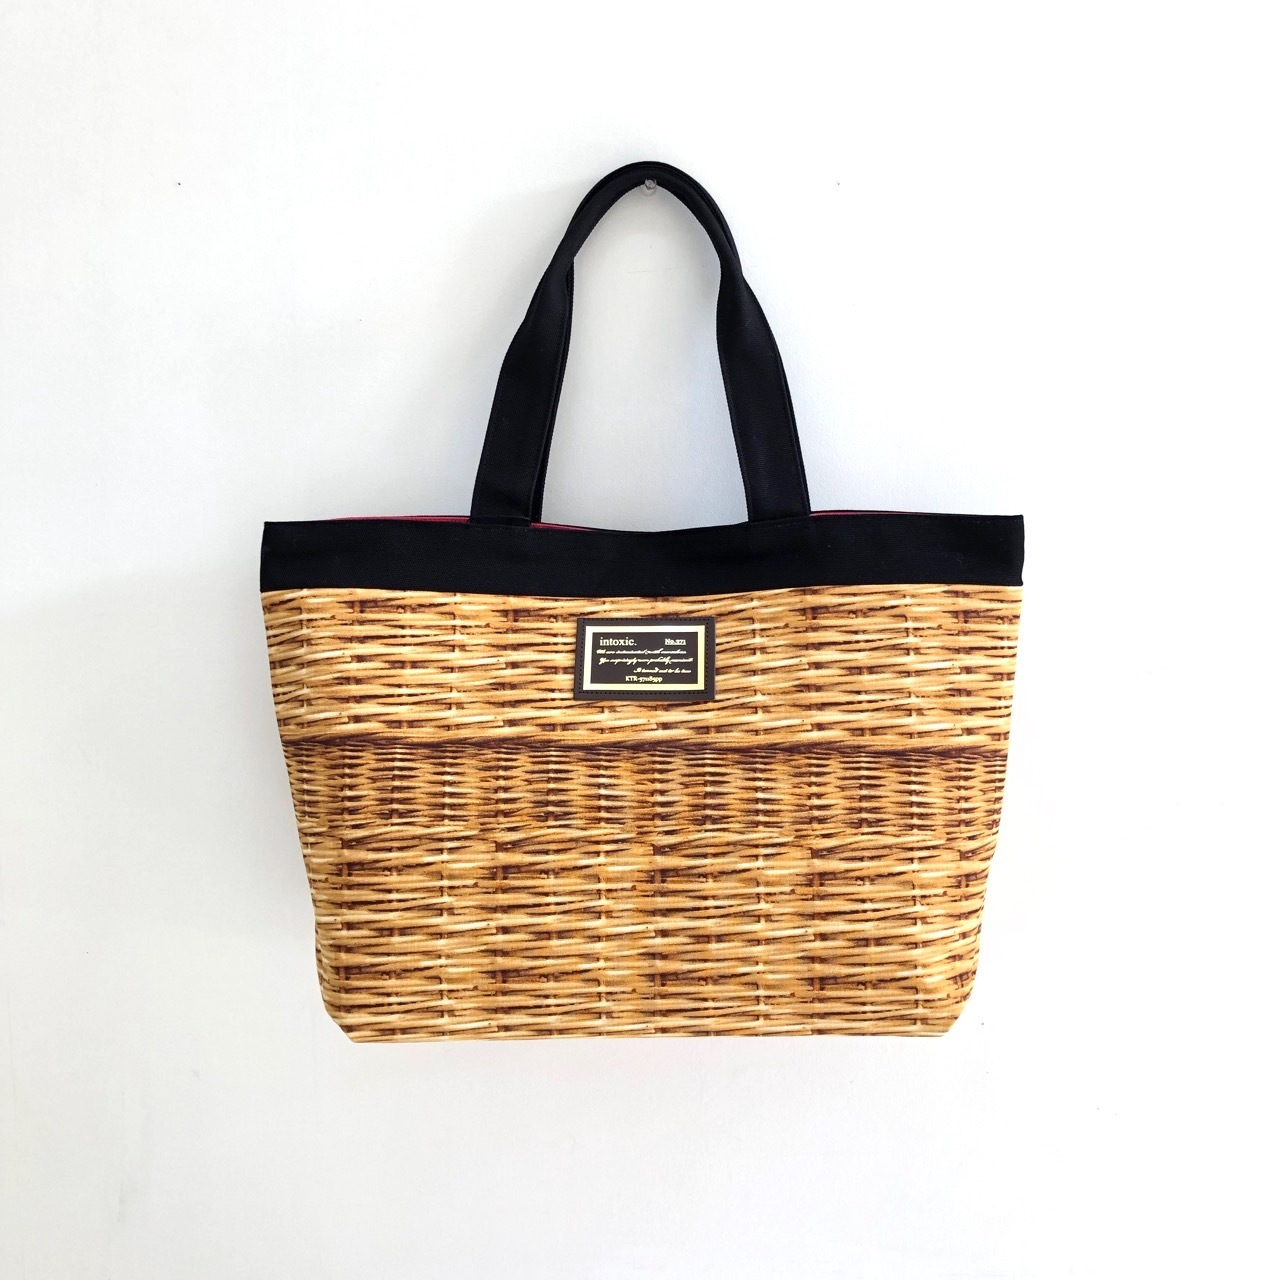 【 INTOXIC 】BASIC TOTE BAG